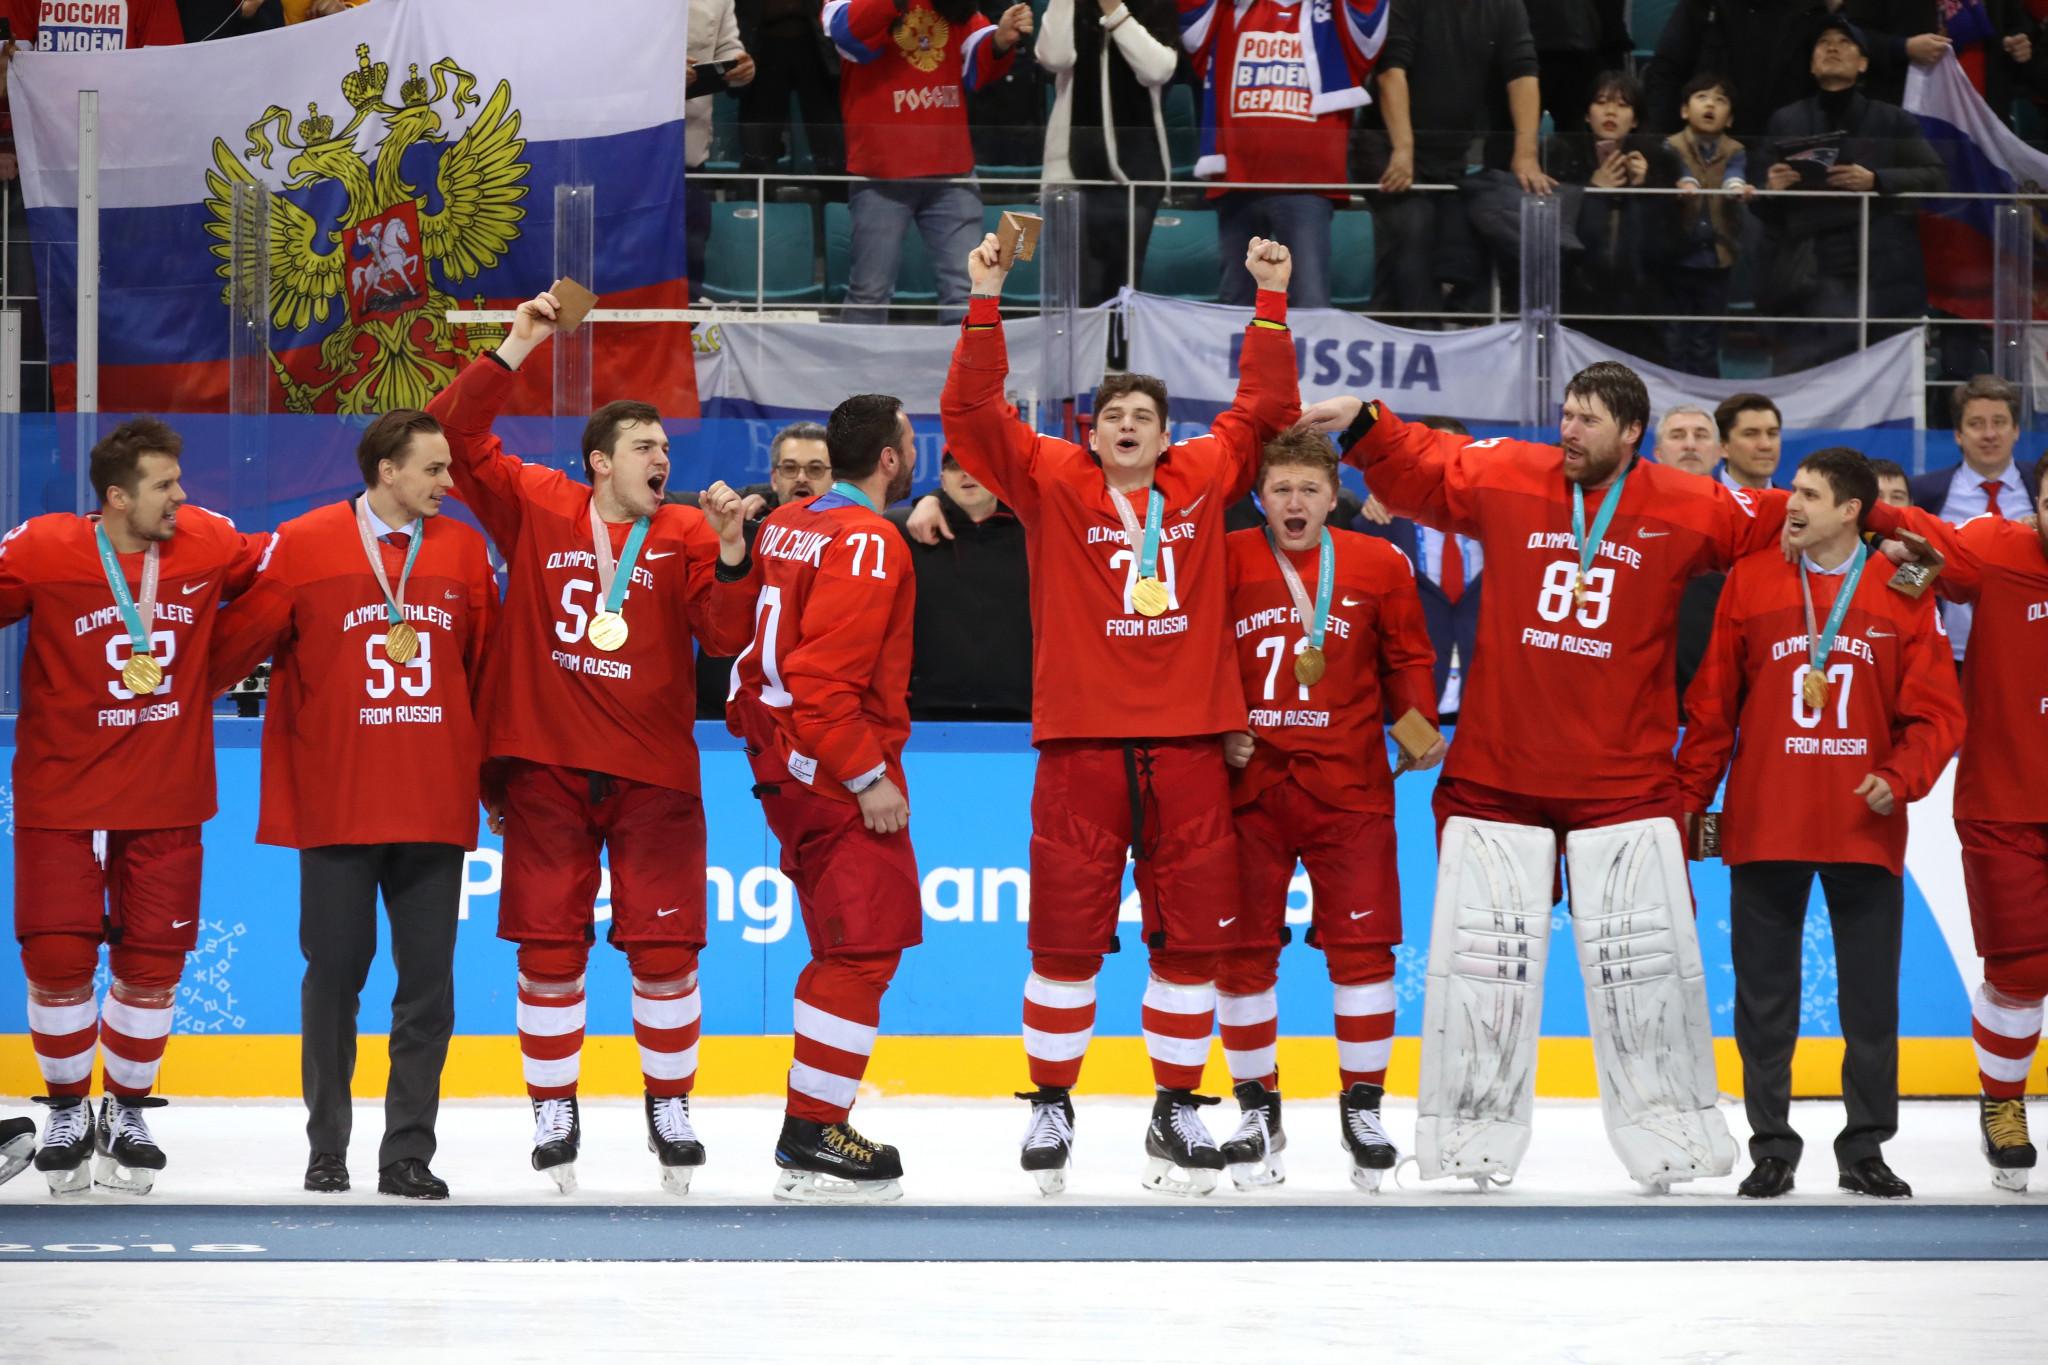 Putin congratulates OAR ice hockey team after Olympic win